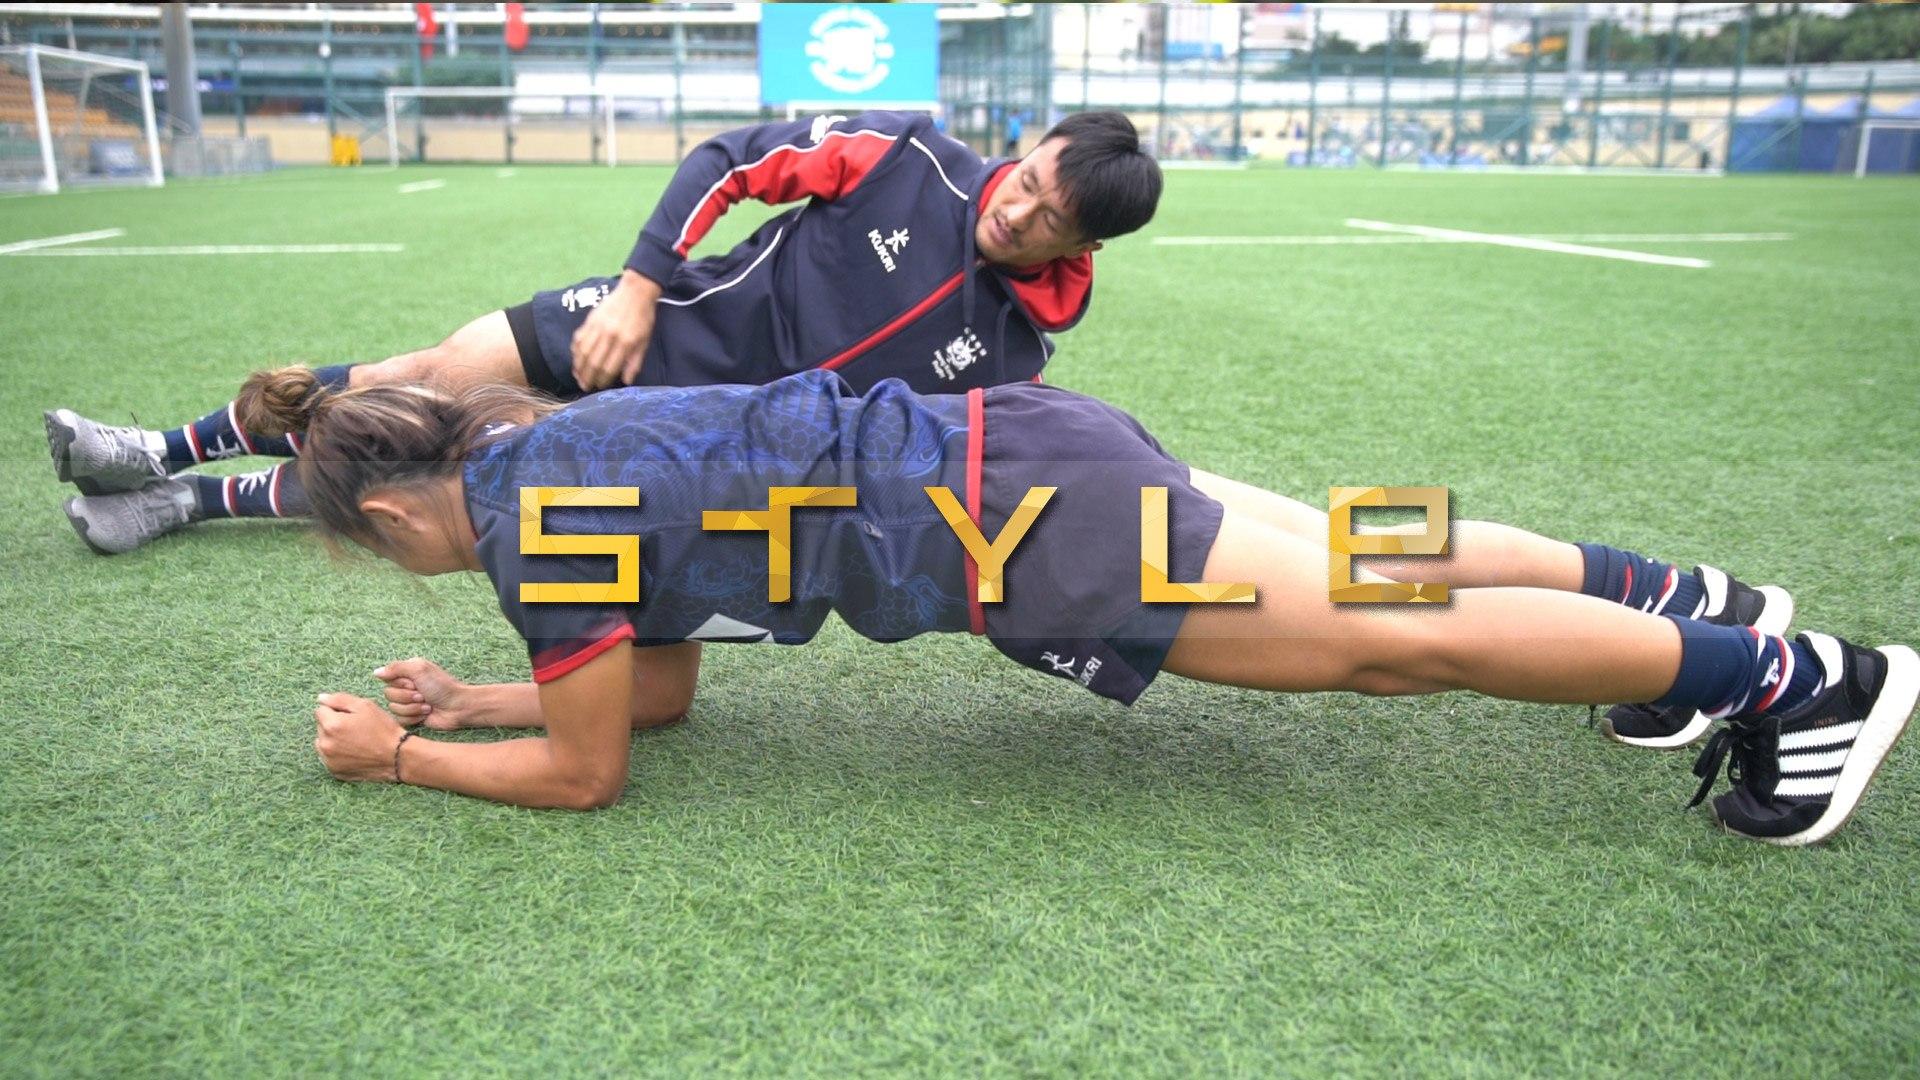 Hong Kong Rugby Sevens players talk char siu bao and mental strength